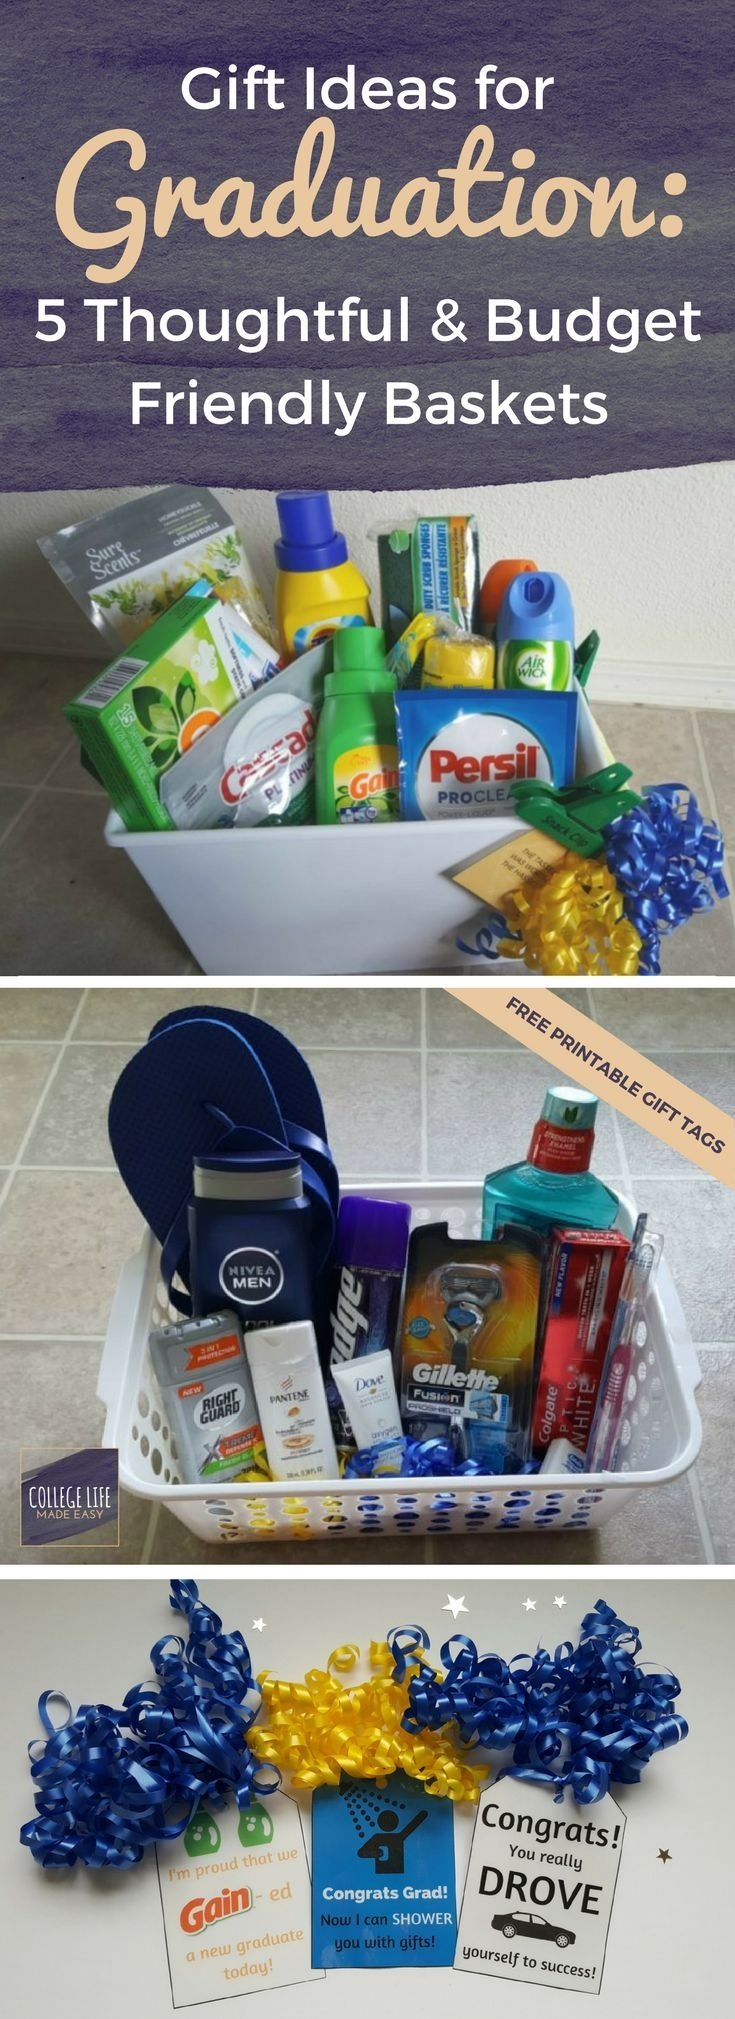 10 Most Popular Creative High School Graduation Gift Ideas 157 best graduation gift ideas images on pinterest graduation 16 2020